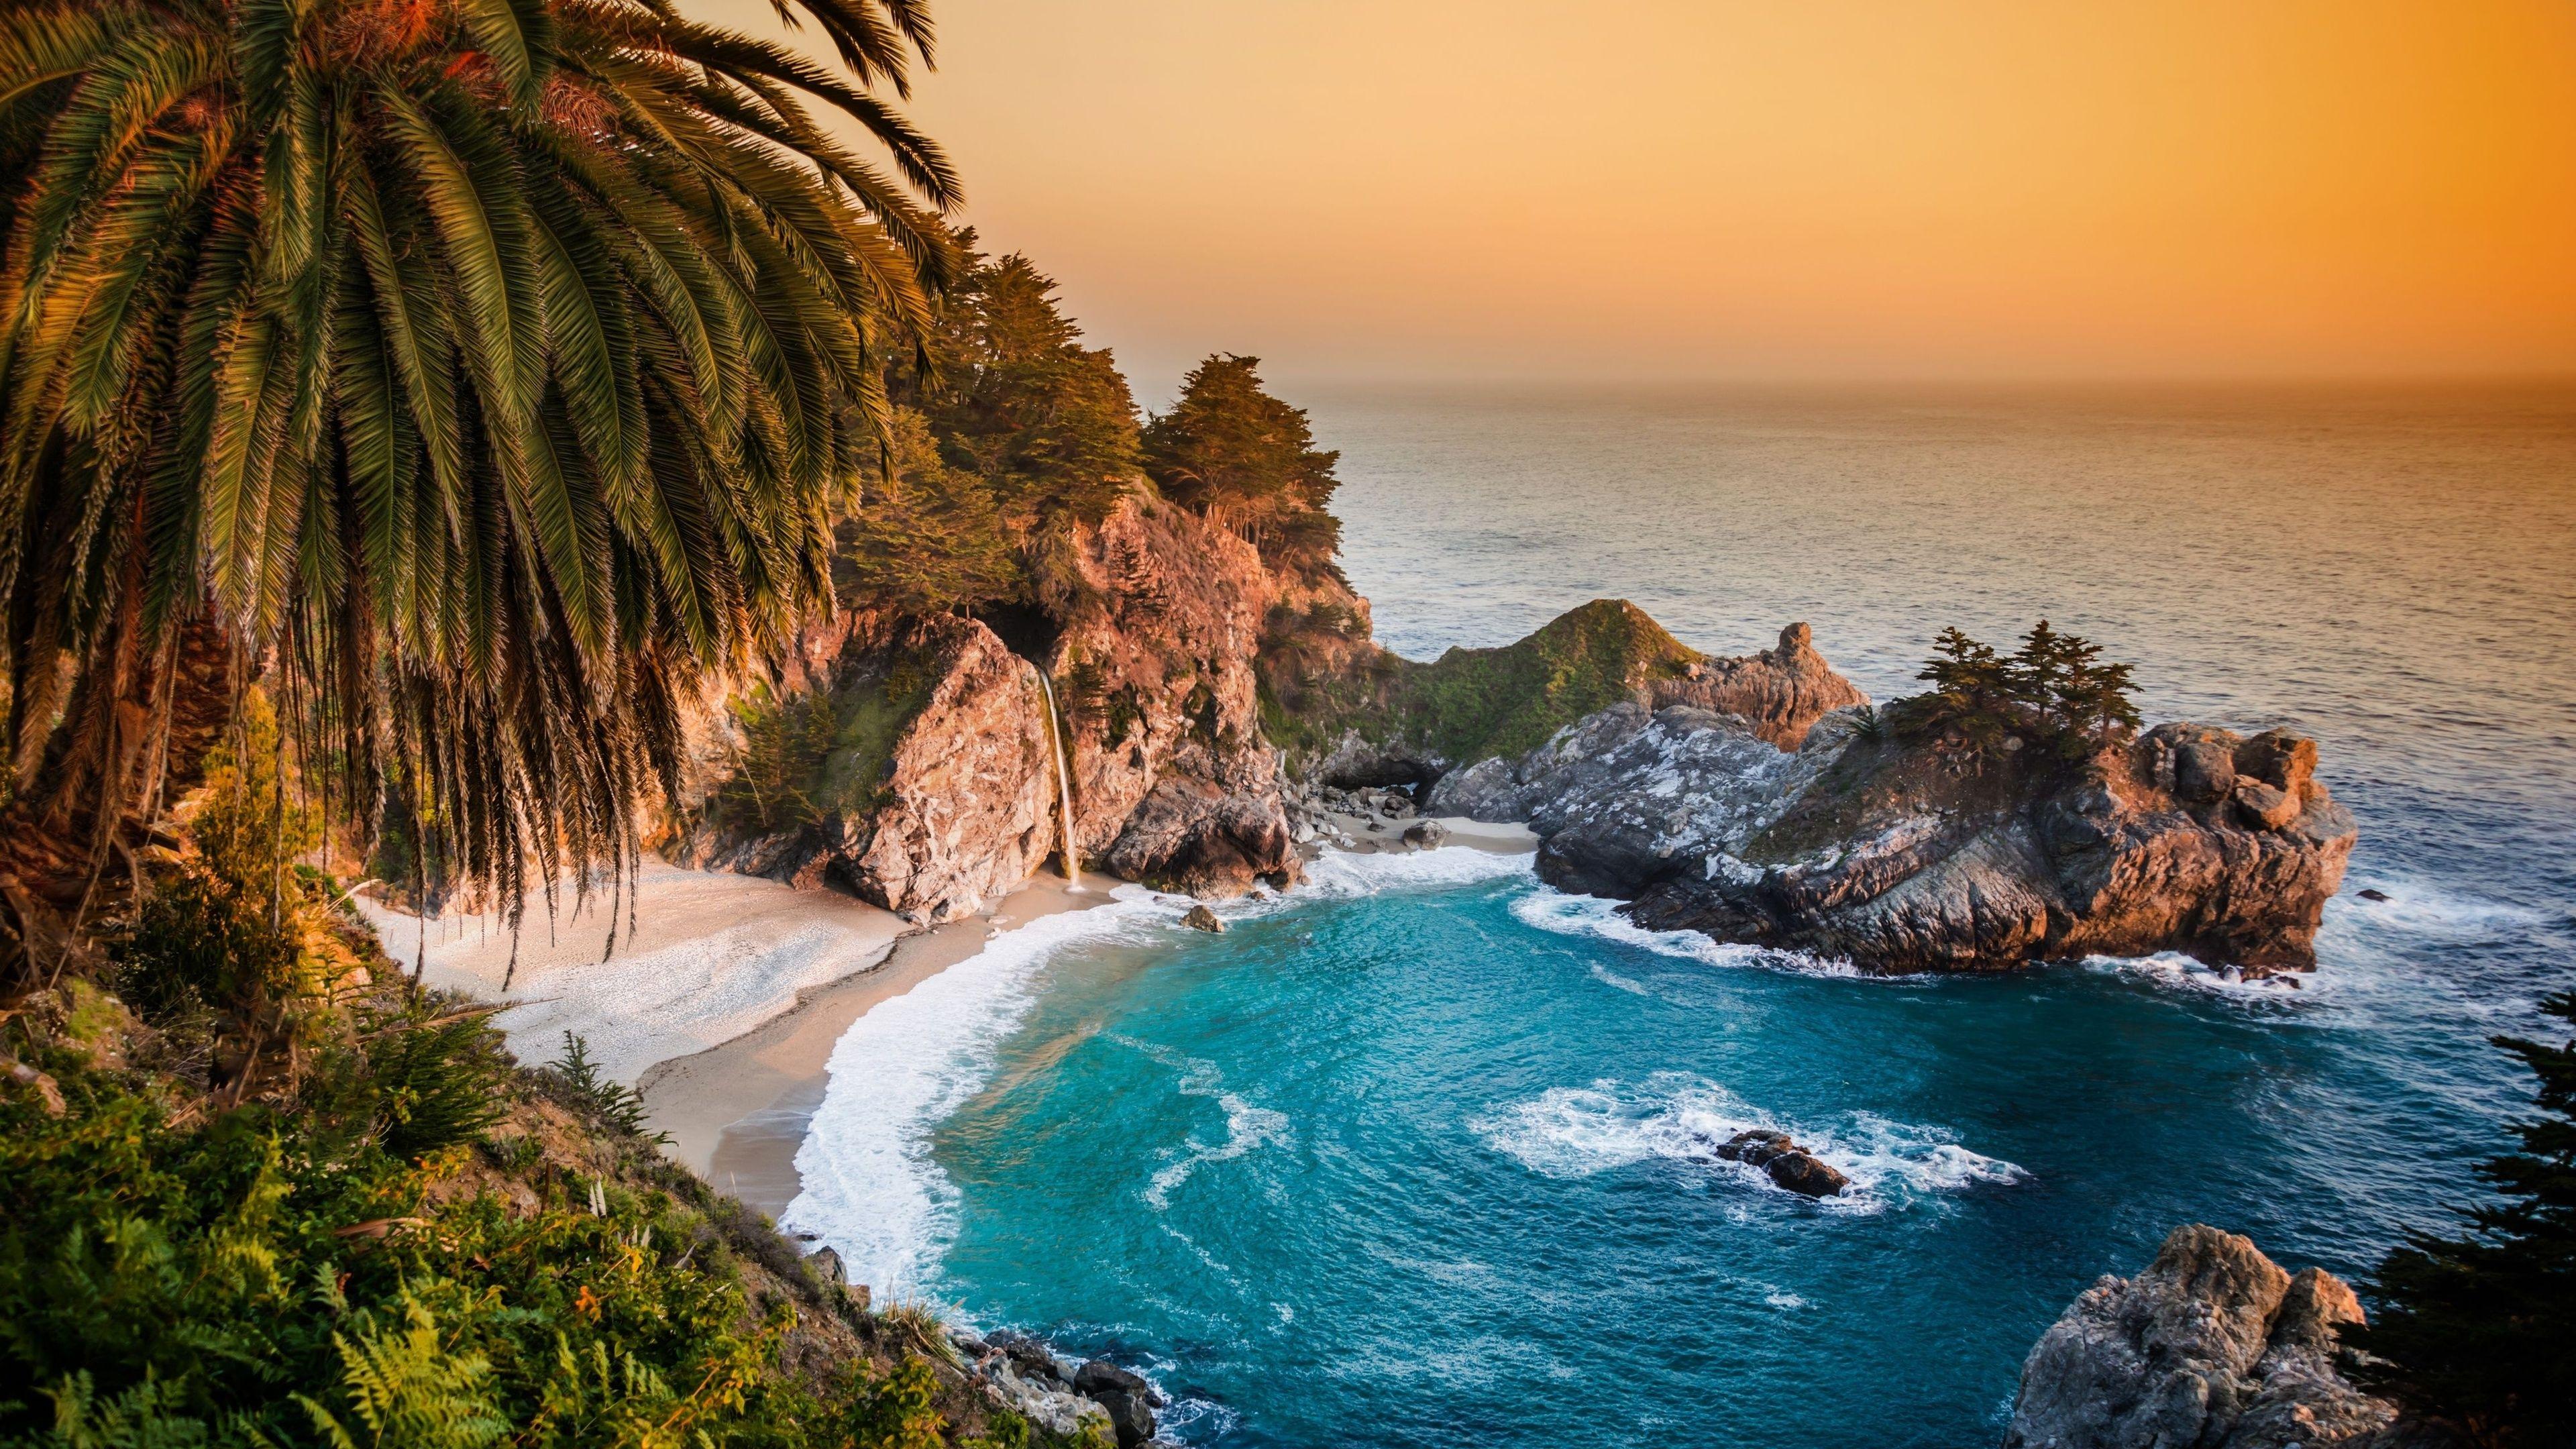 Pacific Ocean Rocks HD desktop wallpaper Widescreen High